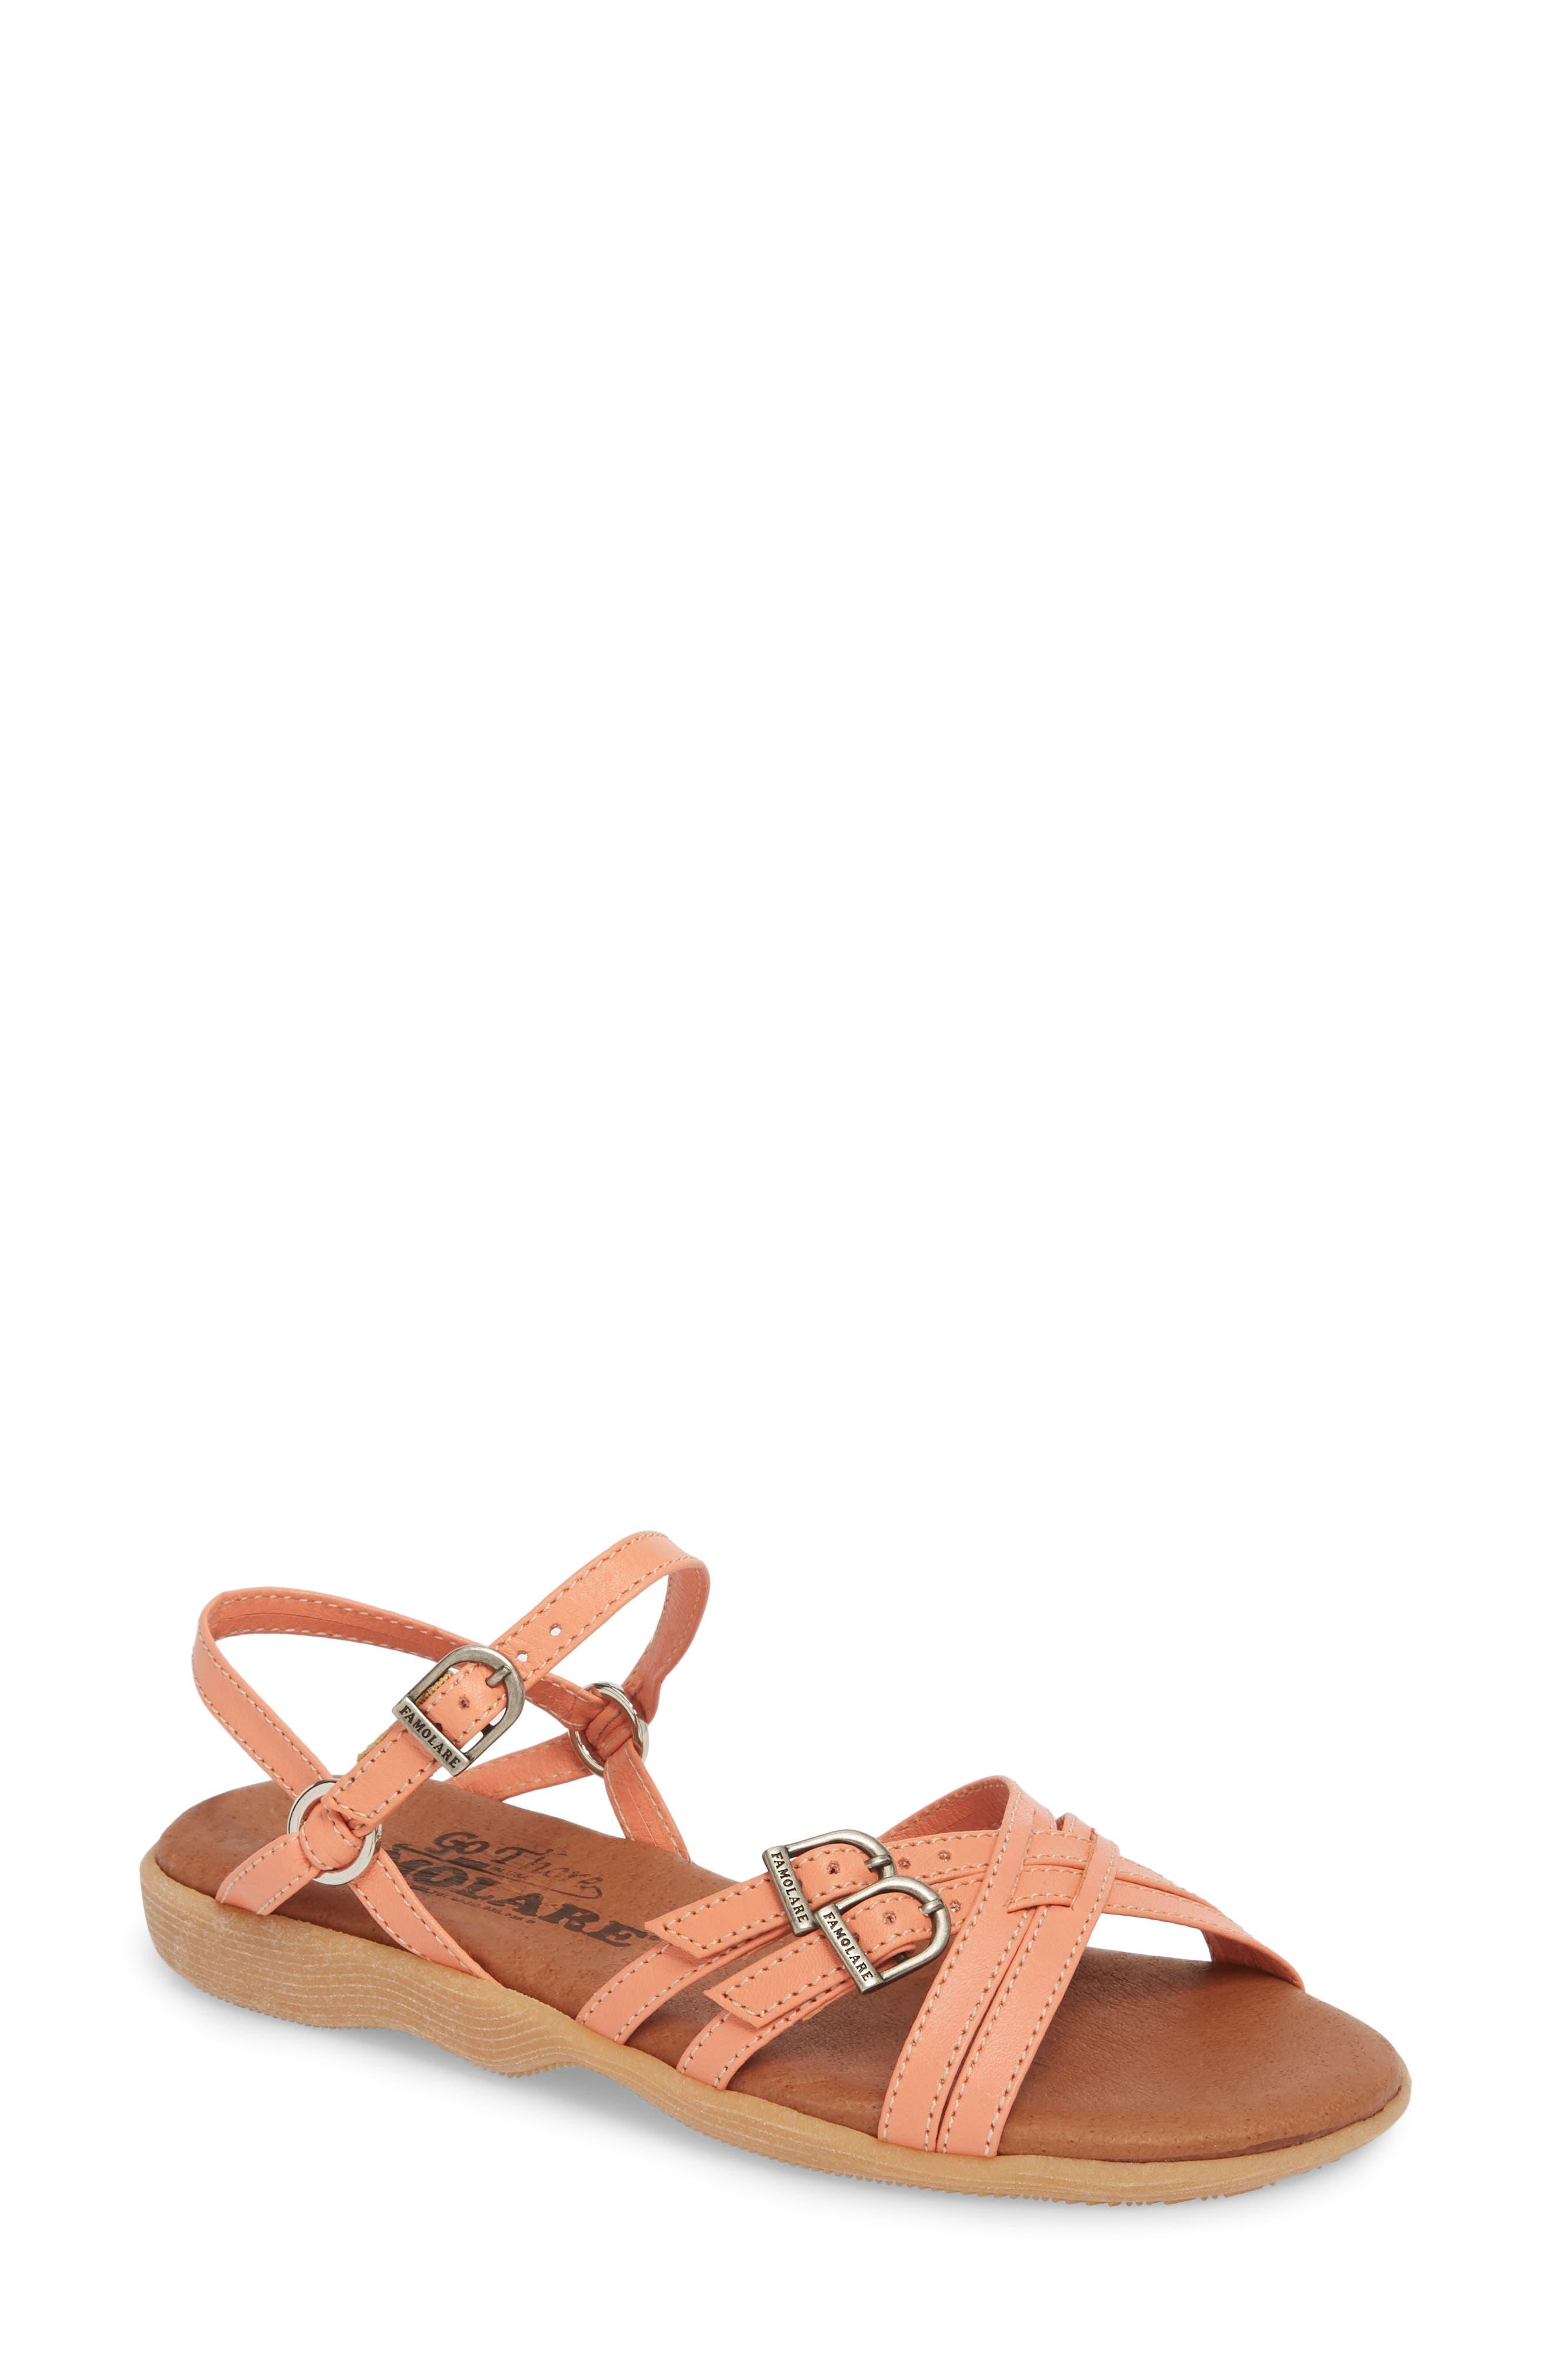 Alternate Image 1 Selected - Famolare Strapsody Buckle Sandal (Women)